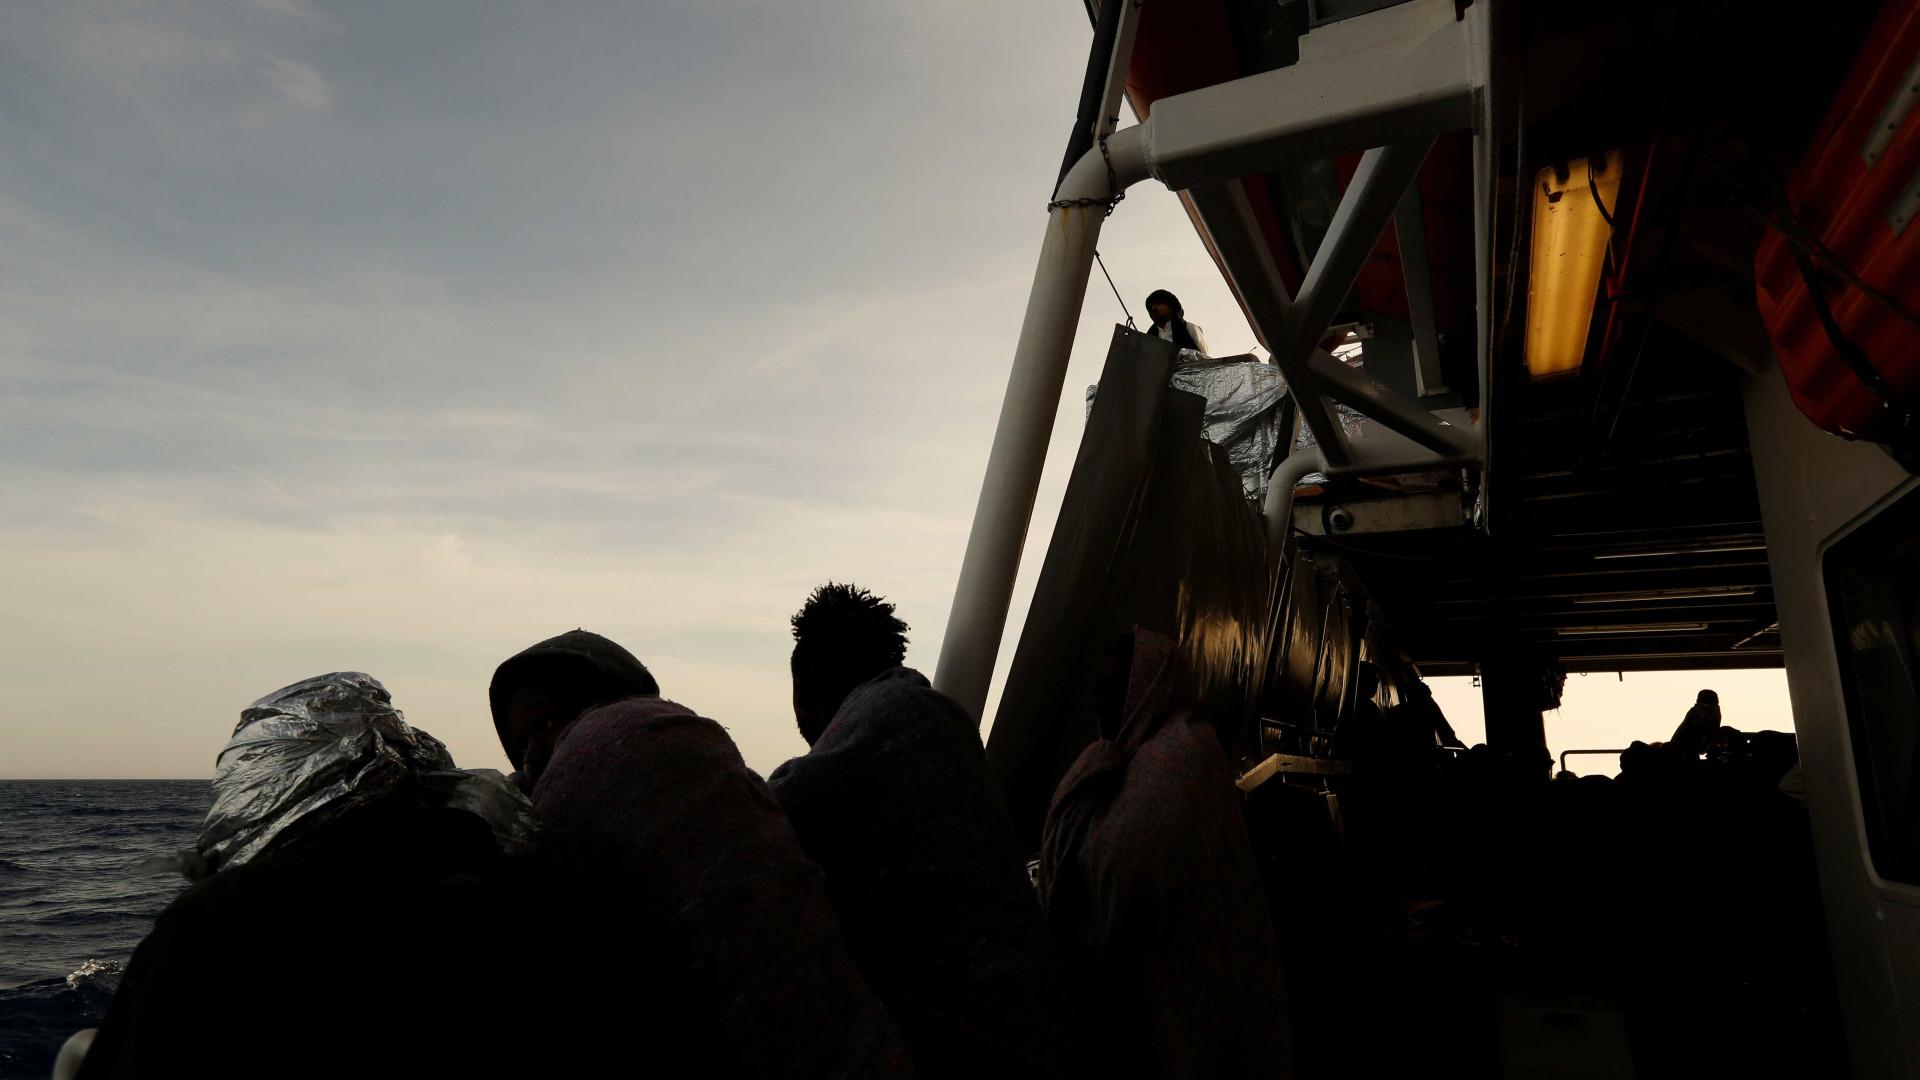 Líbia: naufrágio tem 90 desaparecidos